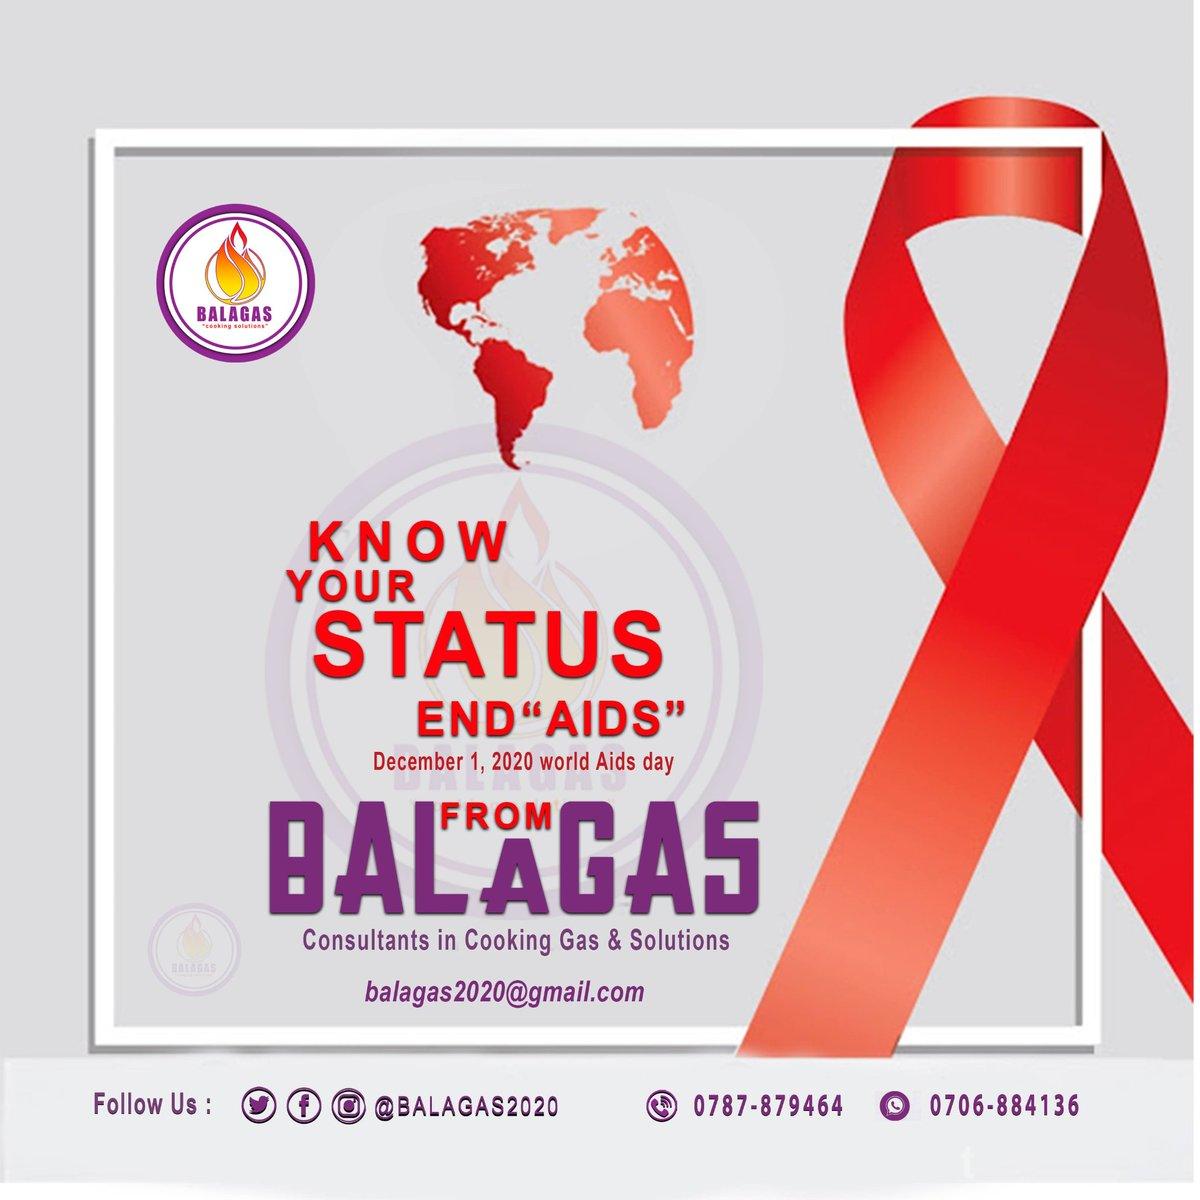 We're part of the struggle against HIV/AIDS in Our Motherland Uganda 🇺🇬 #WorldAIDSDay2020  #KnowYourHIVStatus #StopTransmissiin